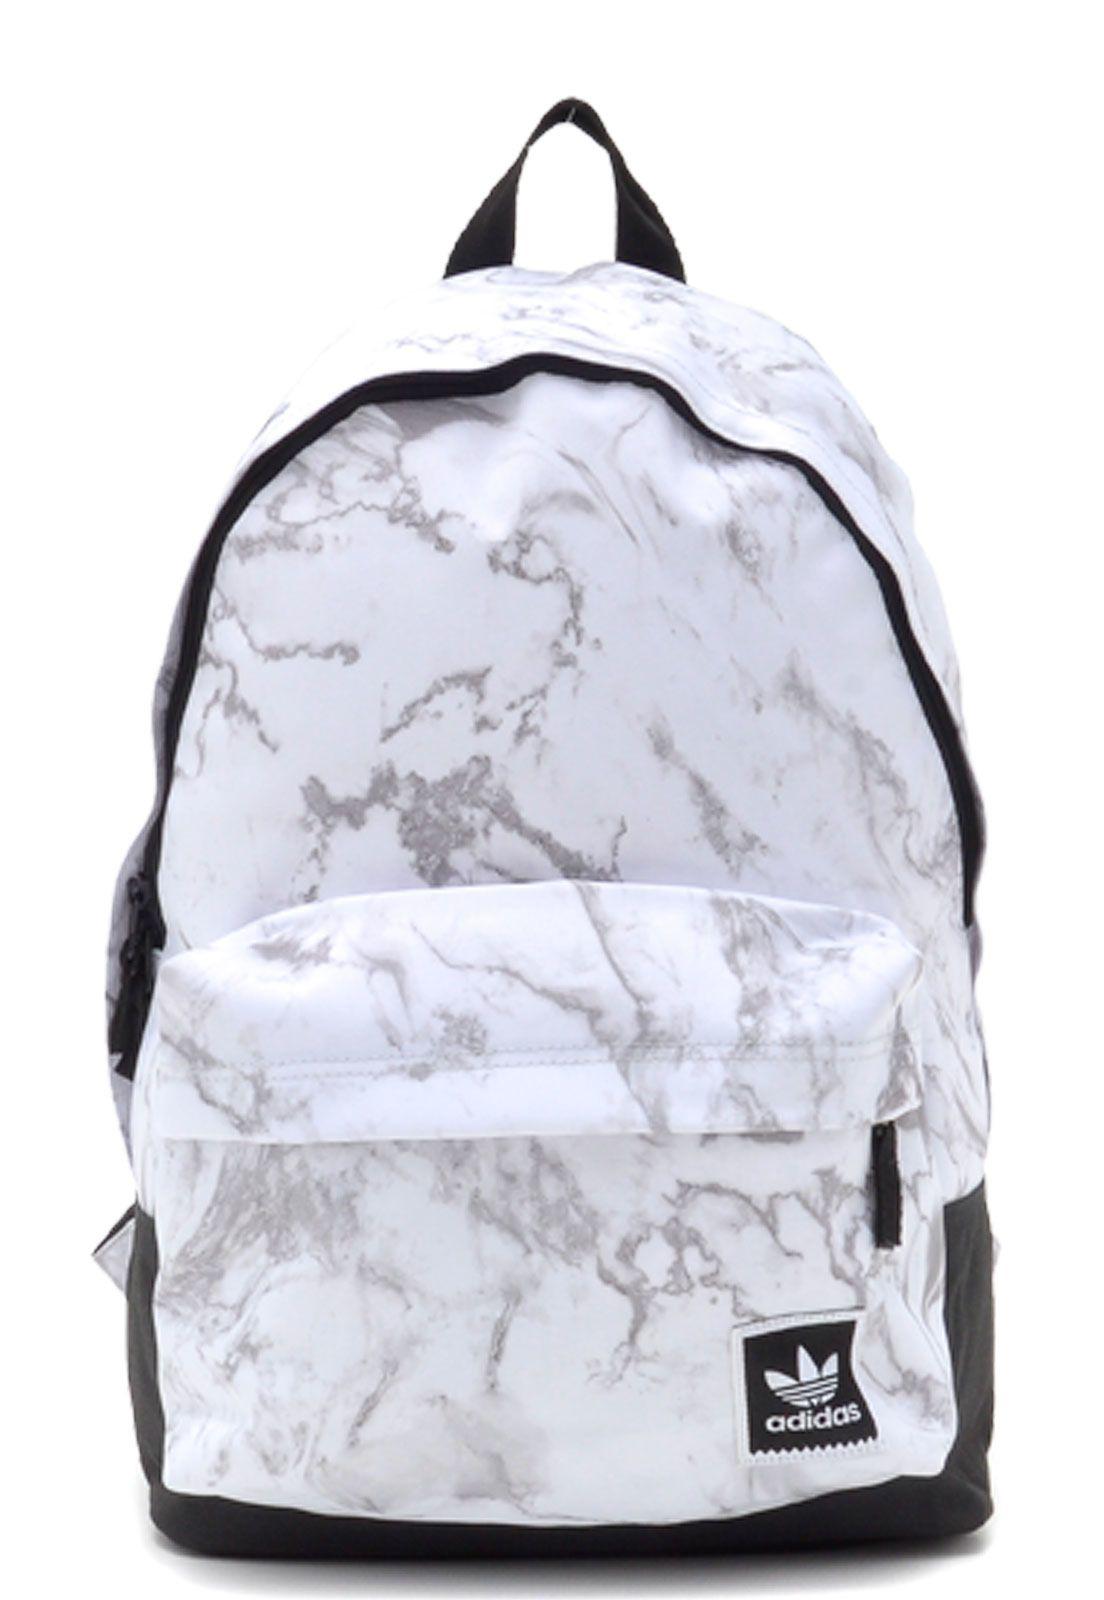 Mochila adidas Skateboarding Aop Backpack Branca em 2020